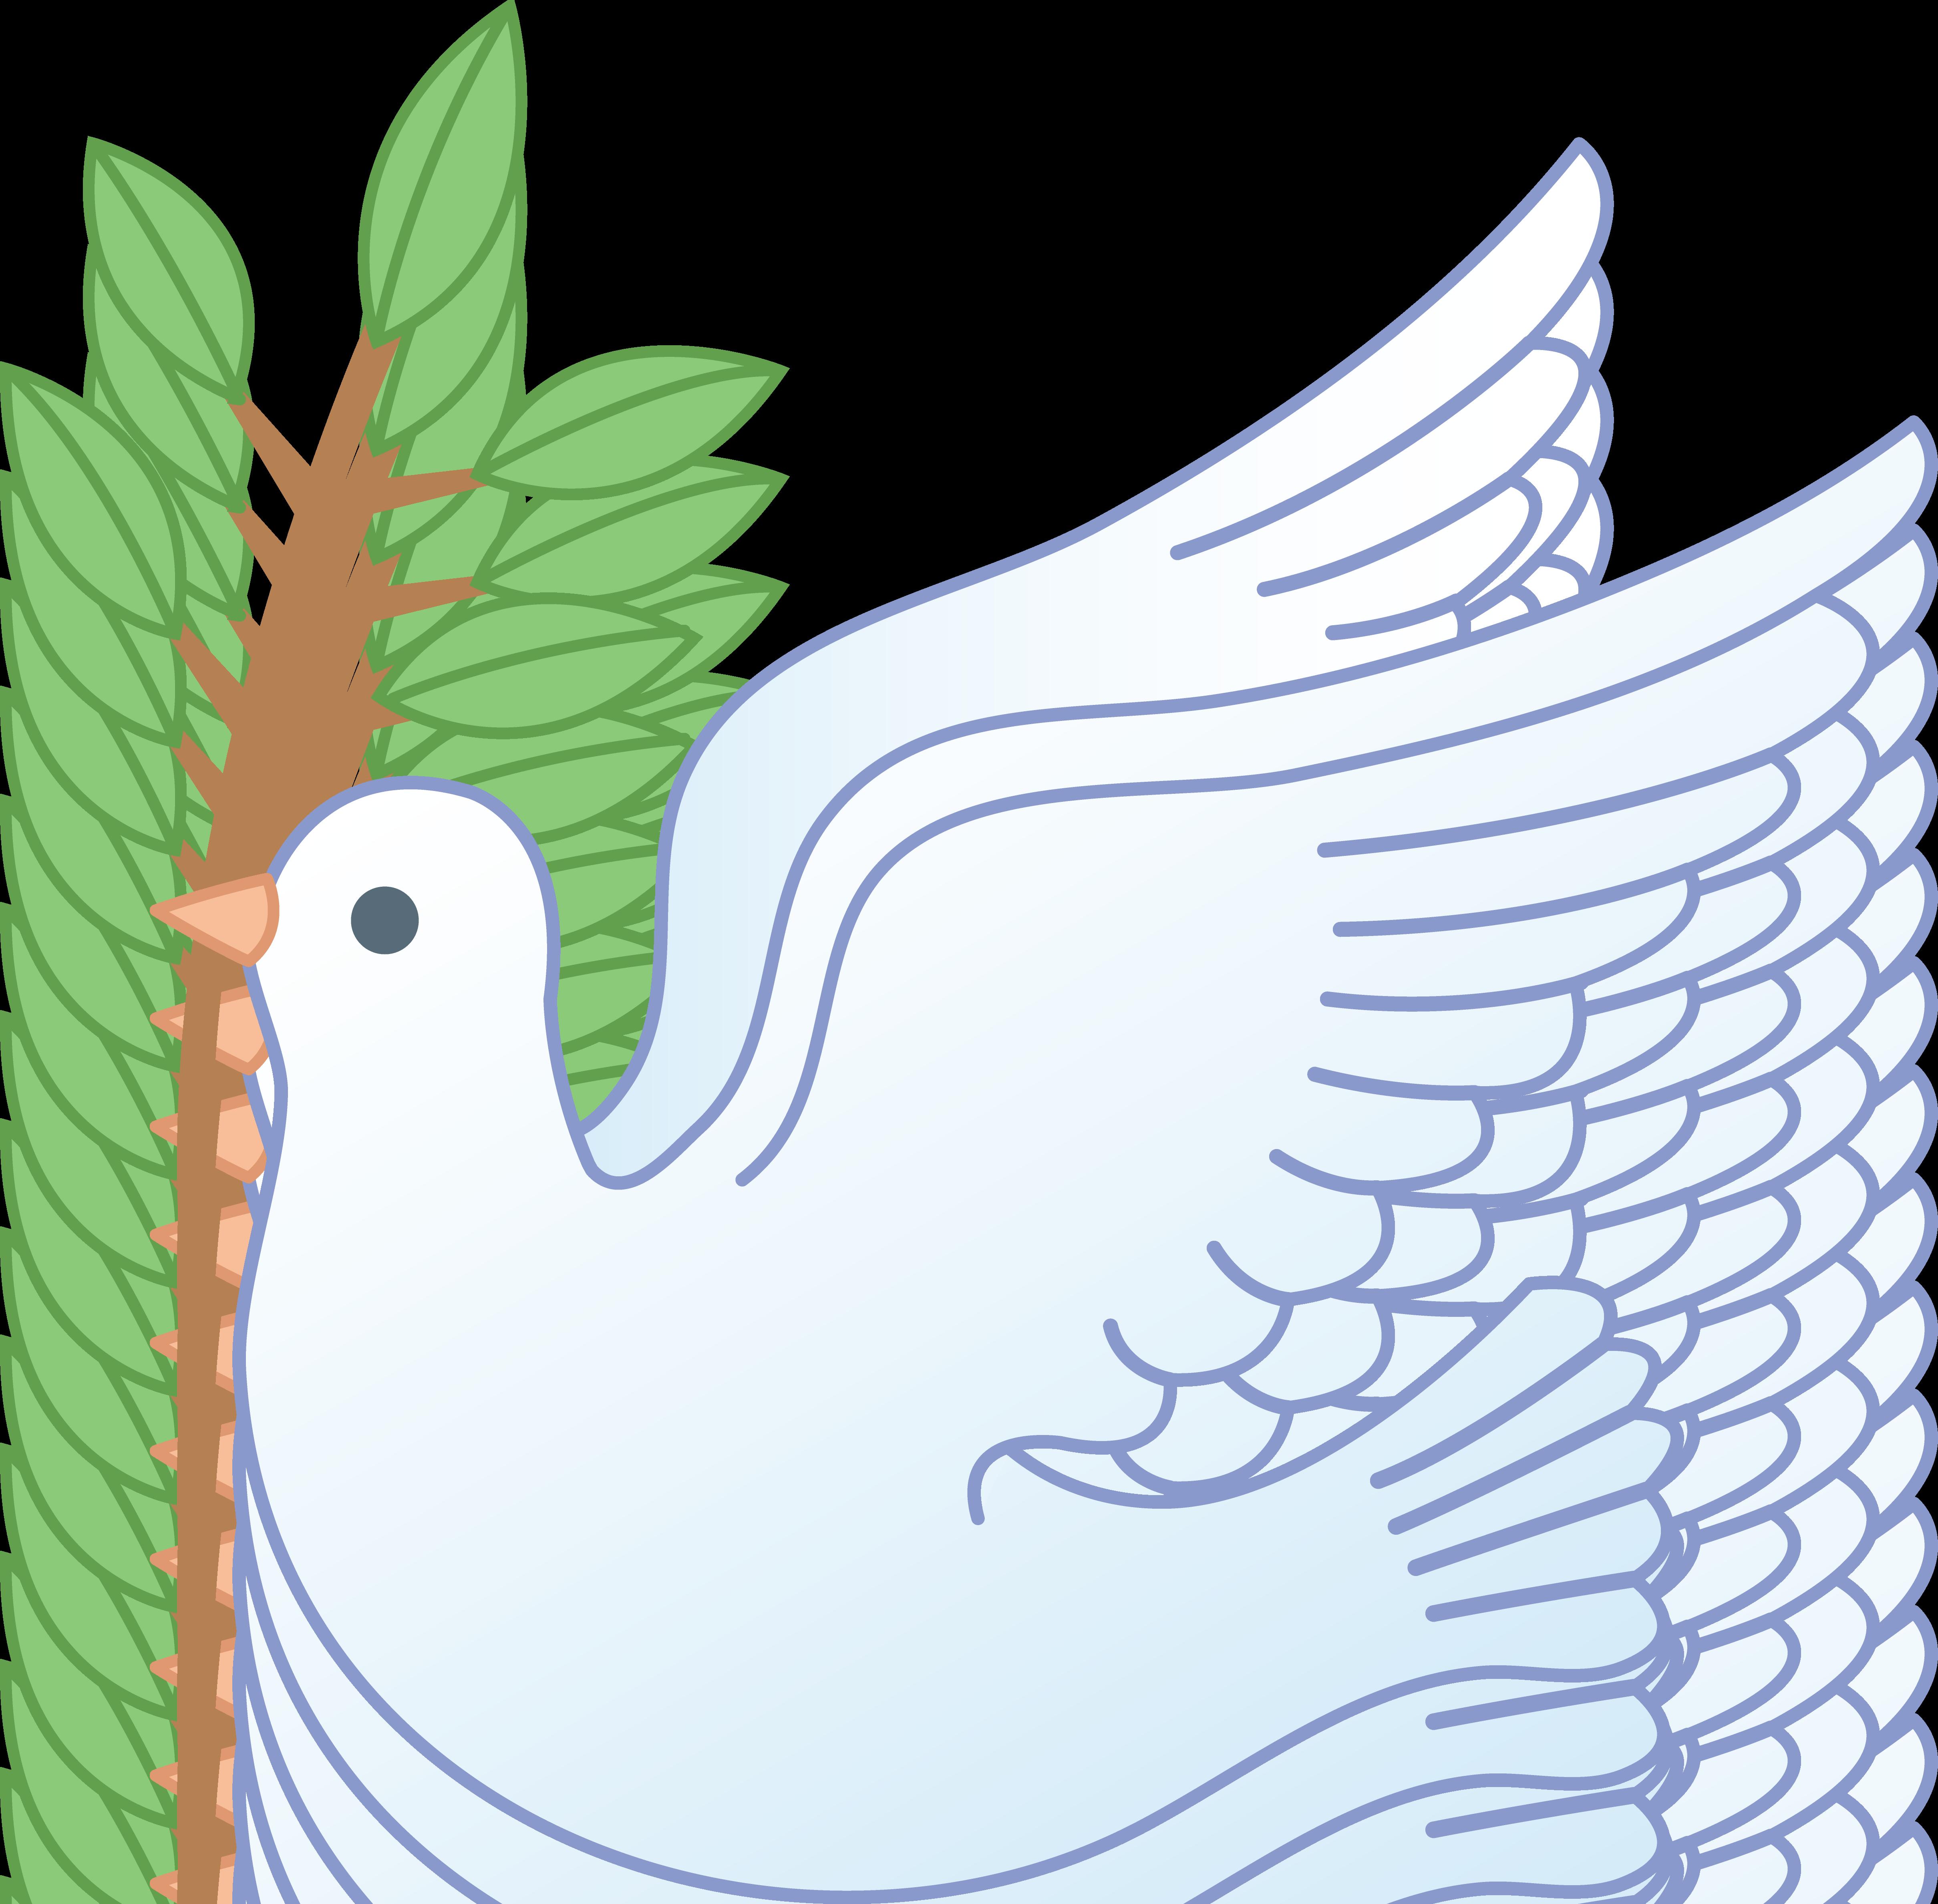 White Peace Dove With Branch Dove And Olive Peace Dove Clip Art